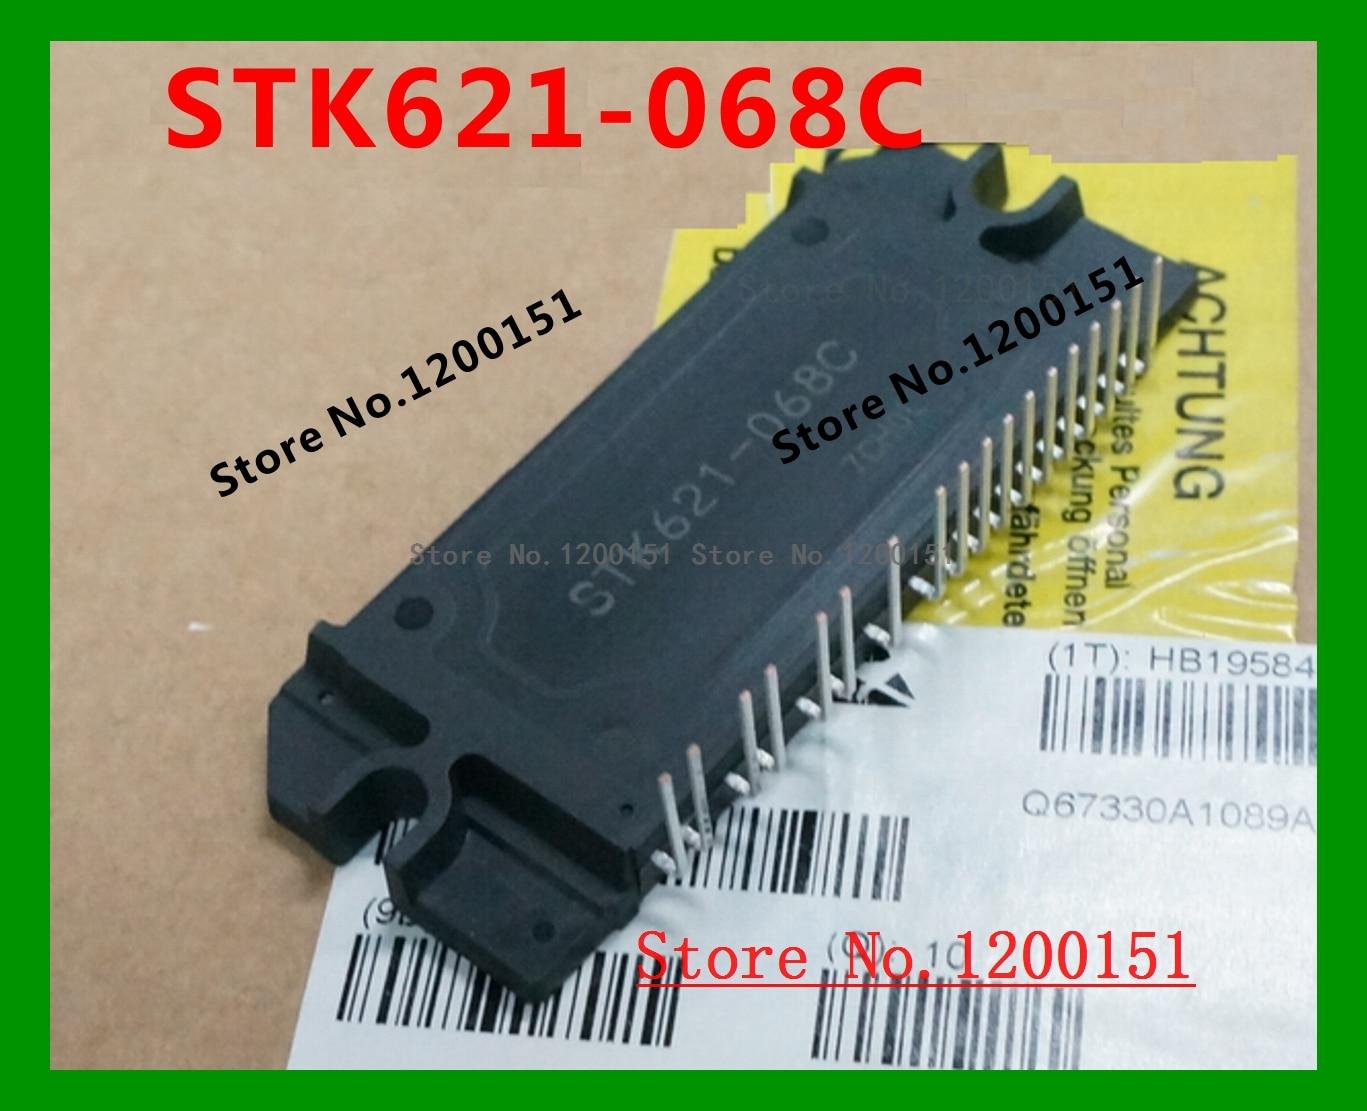 STK621-068C STK621-068R STK621-068S MODULES